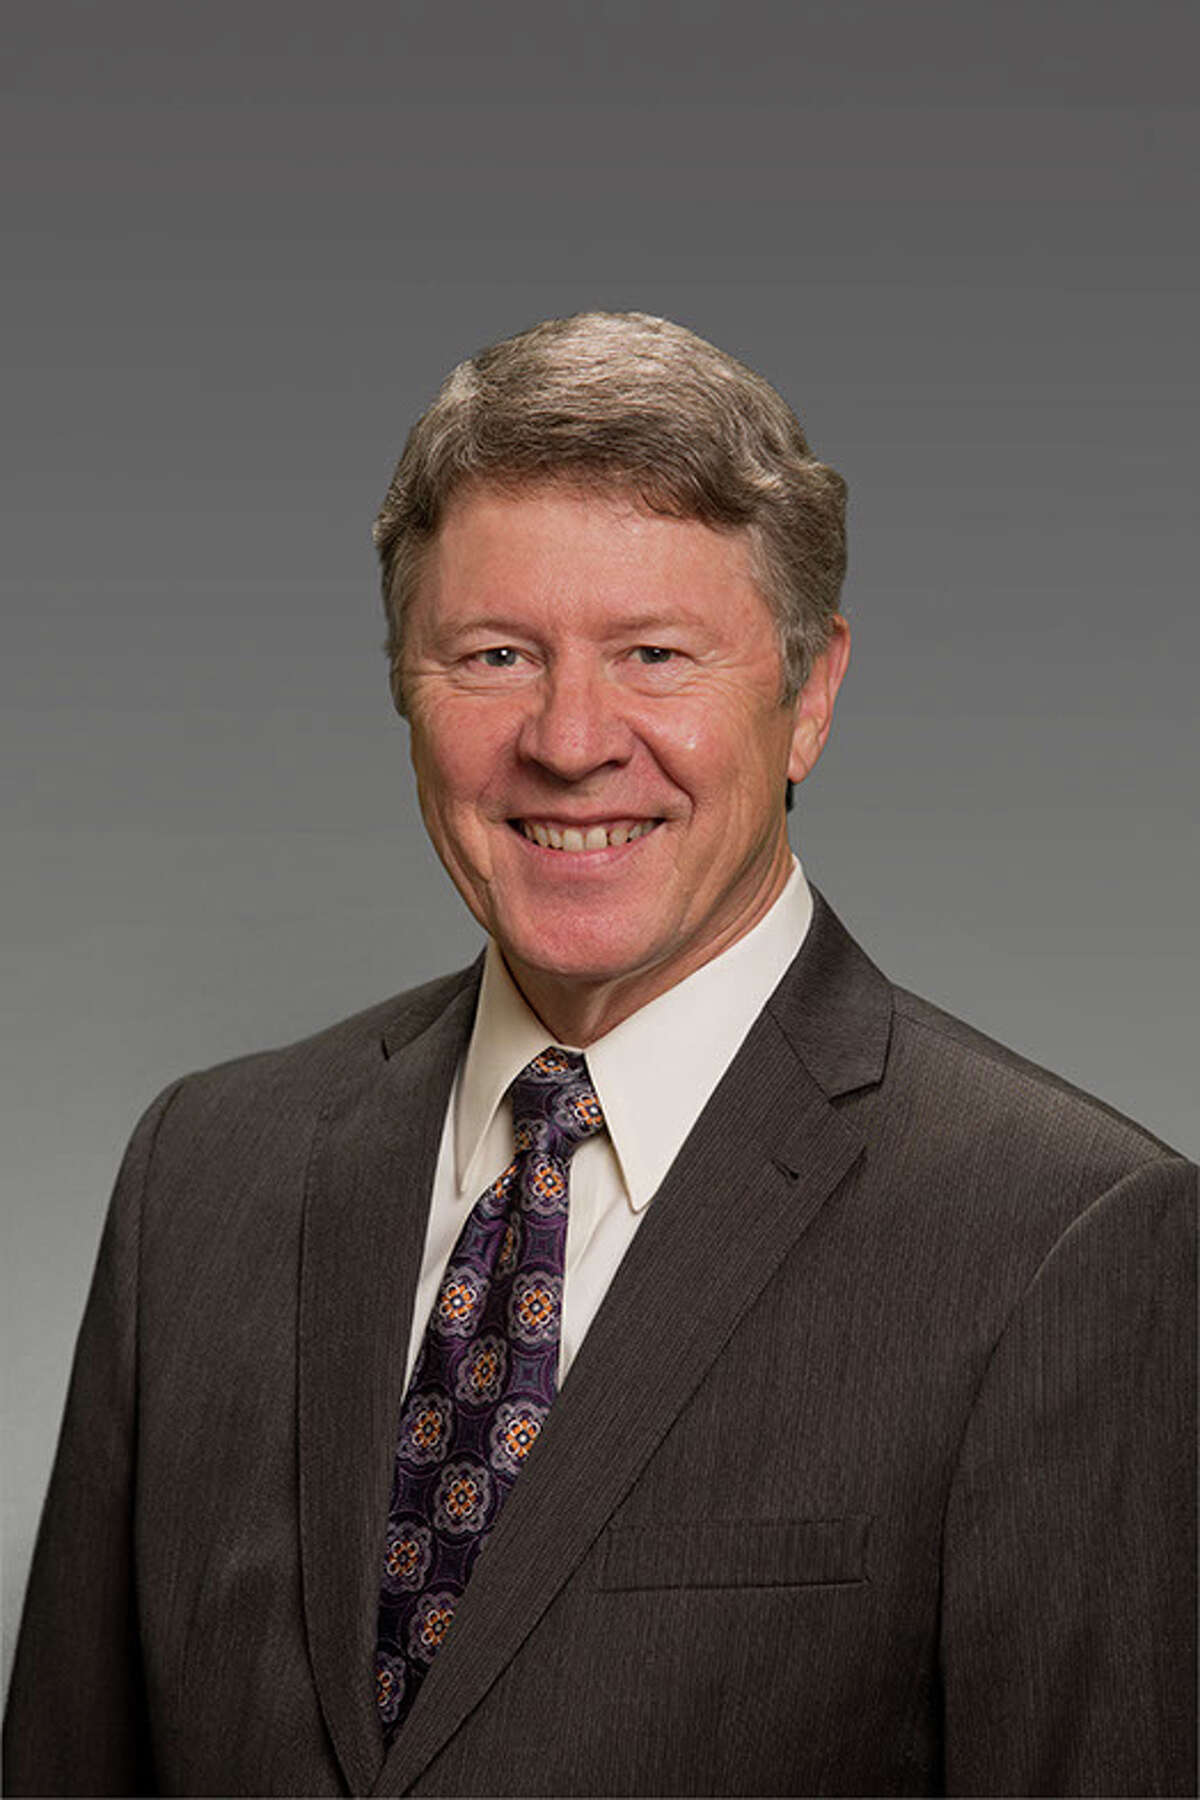 Ed Emmett is Harris County Judge.